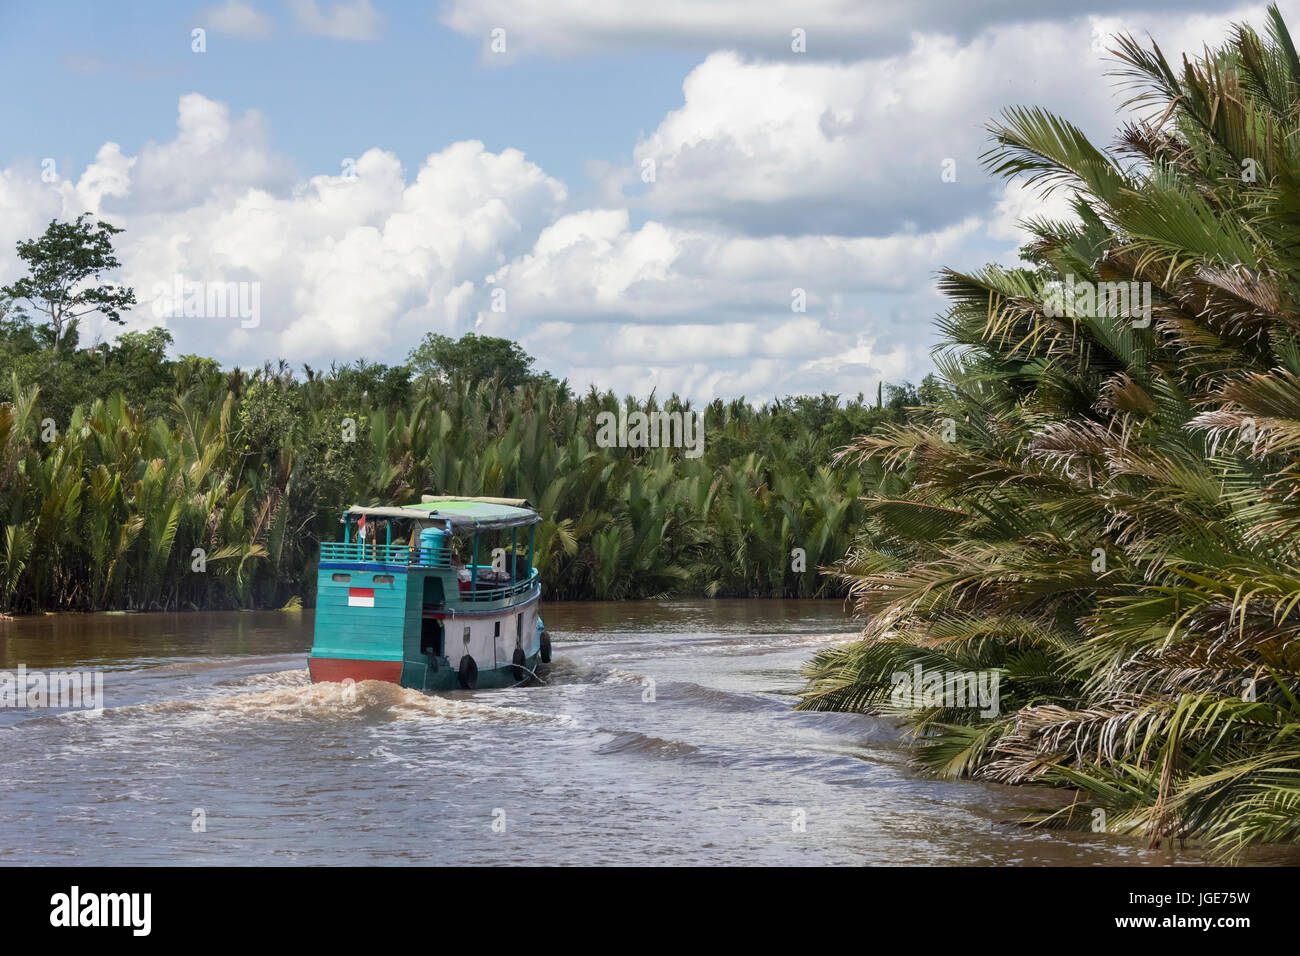 Klotok river boat on the Sekonyer River, Tanjung Puting National Park, Kalimantan Province, Borneo Island - Stock Image